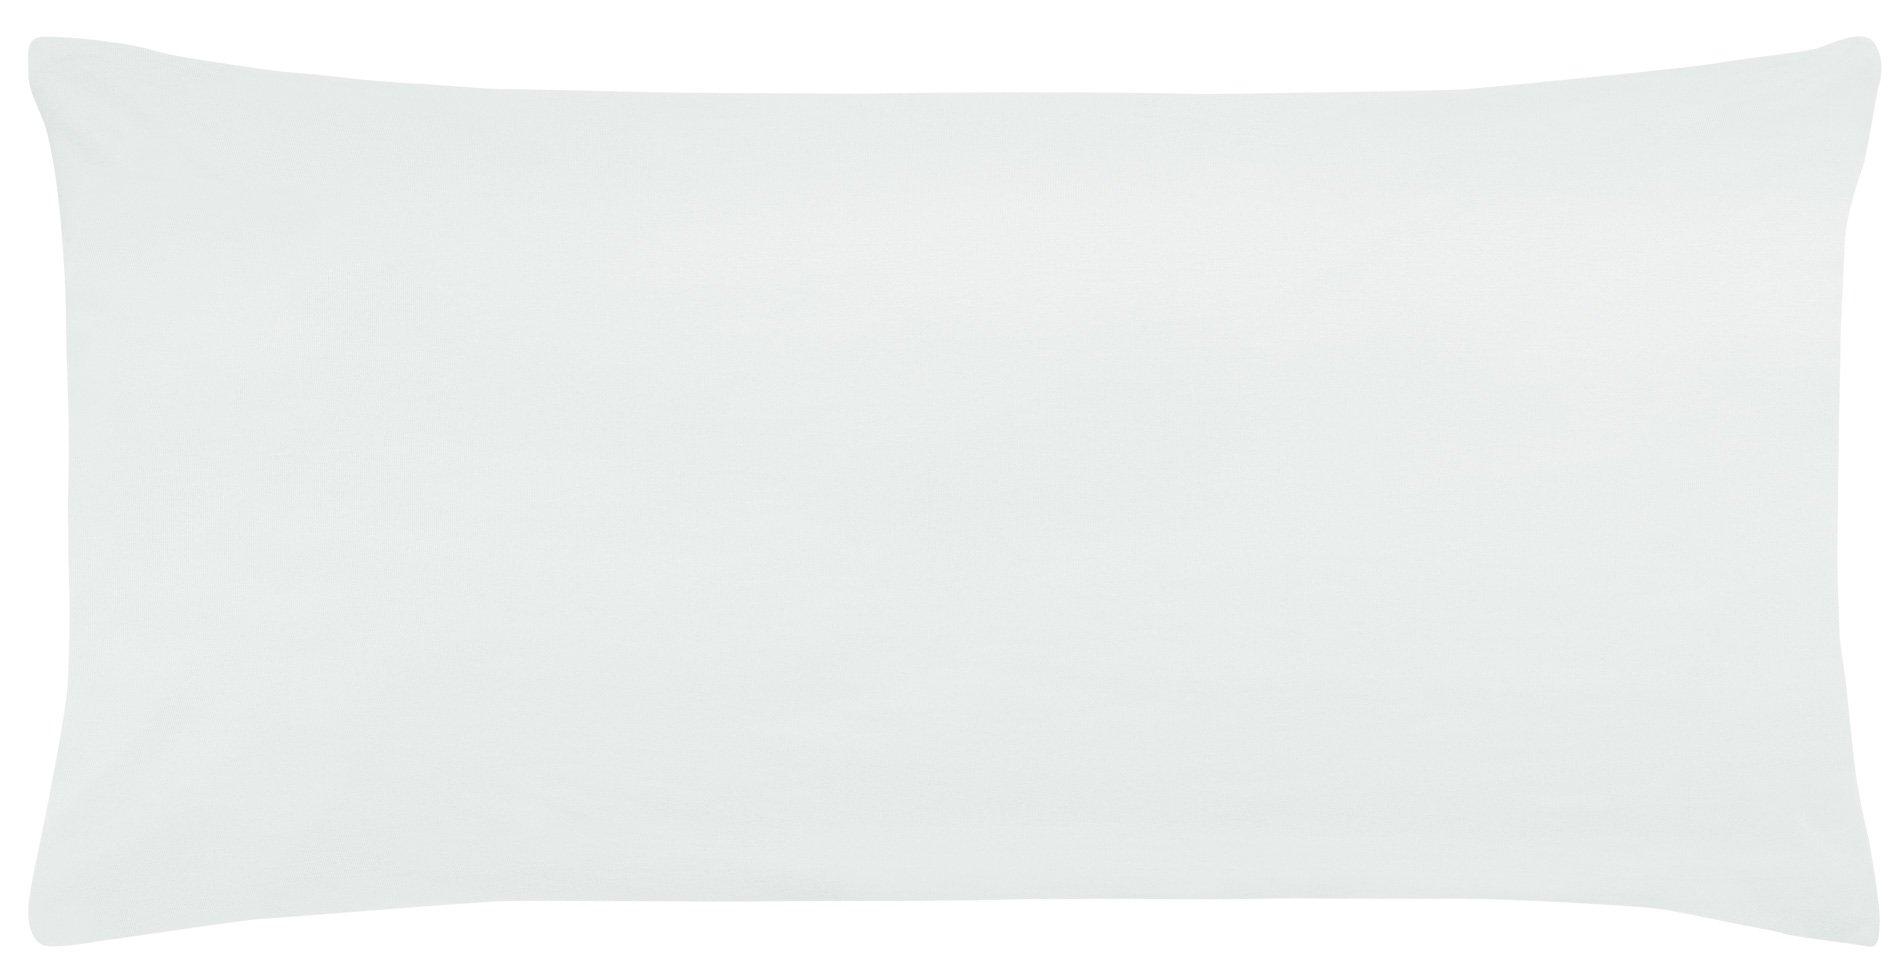 K.-Bezug weiss 40x80cm